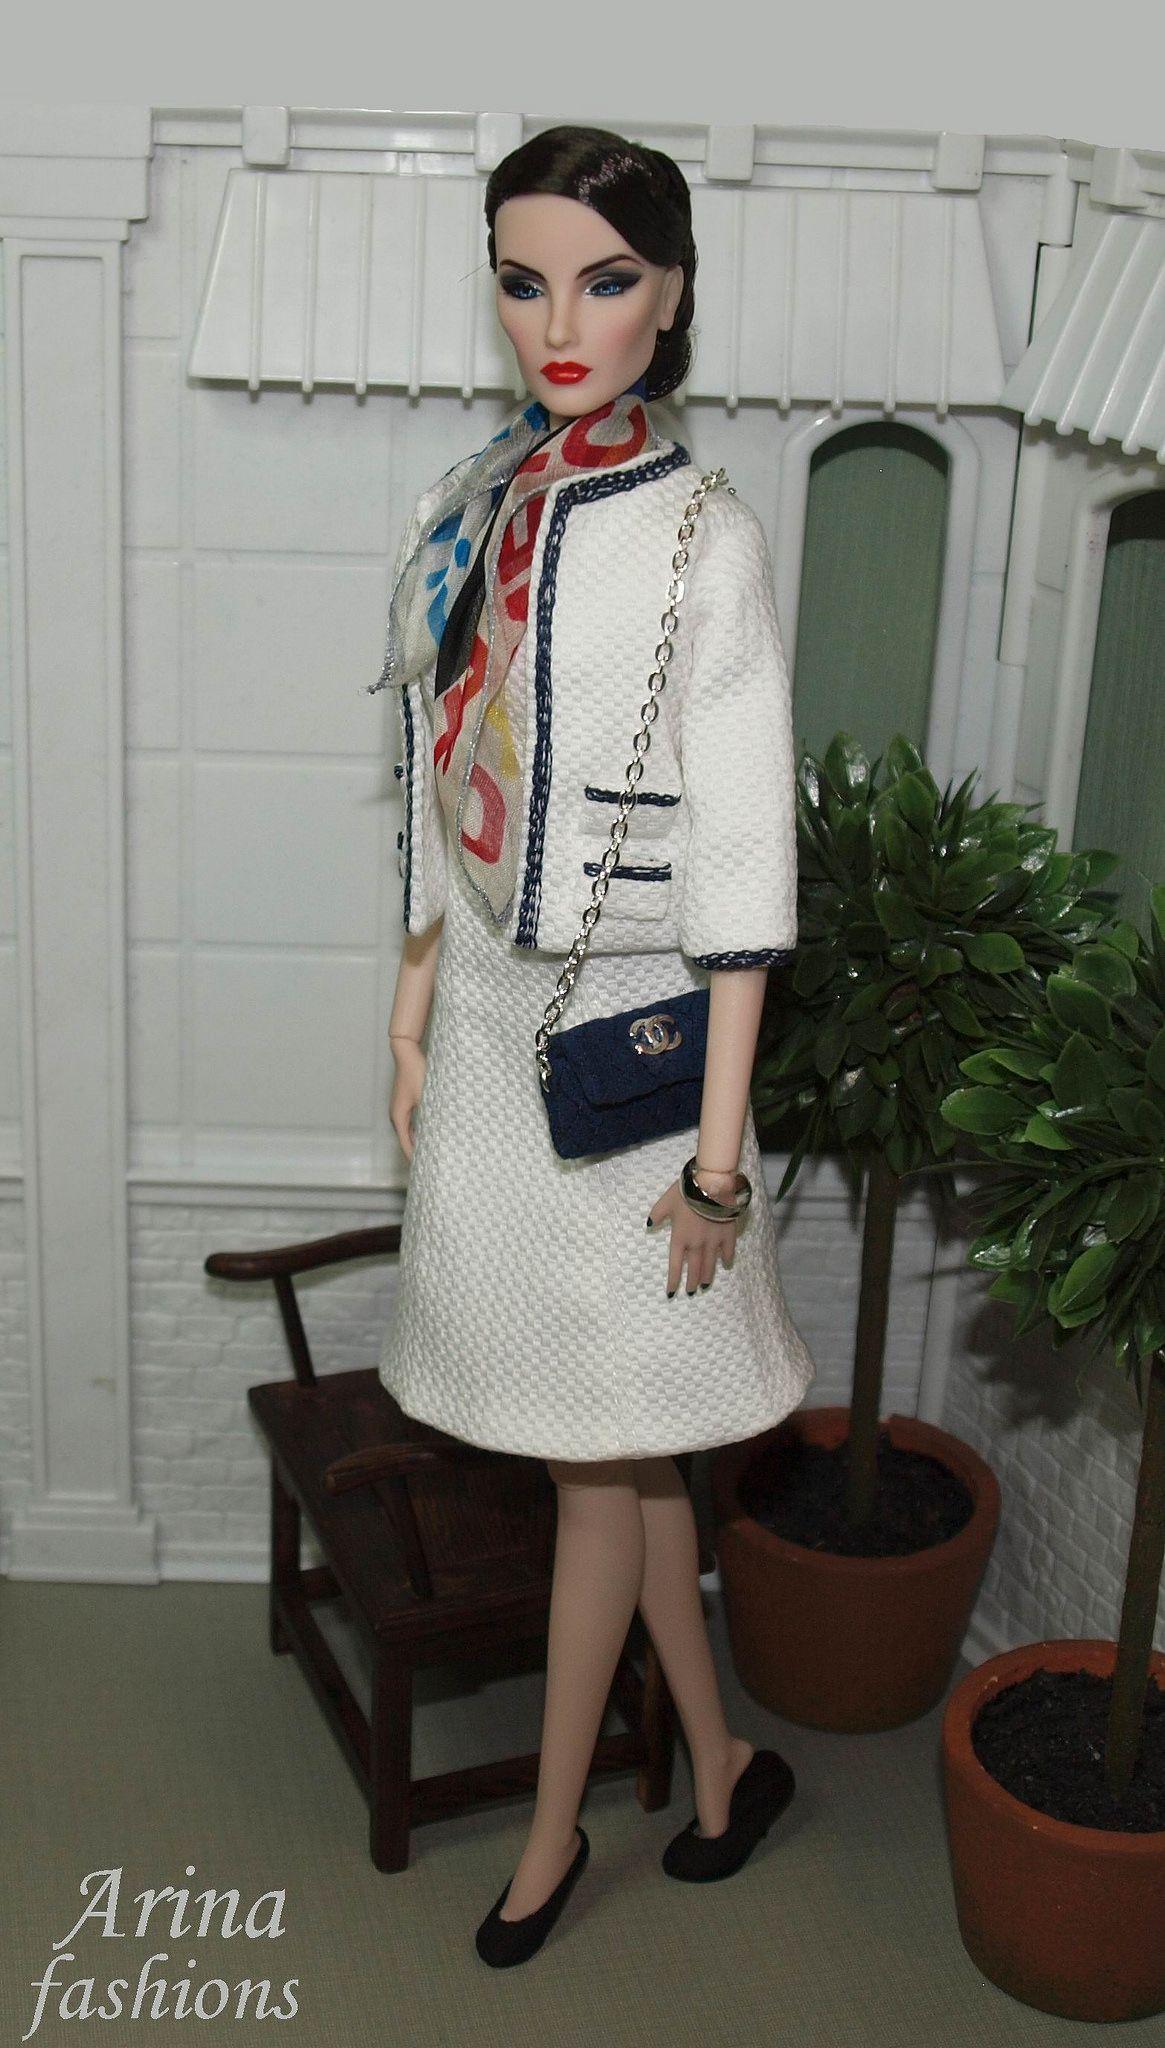 "https://flic.kr/p/jDJsUq | Midnight Star Elise Fashion Royalty | Midnight Star Elise Fashion Royalty in Arina fashions ""Chanel inspiration"""